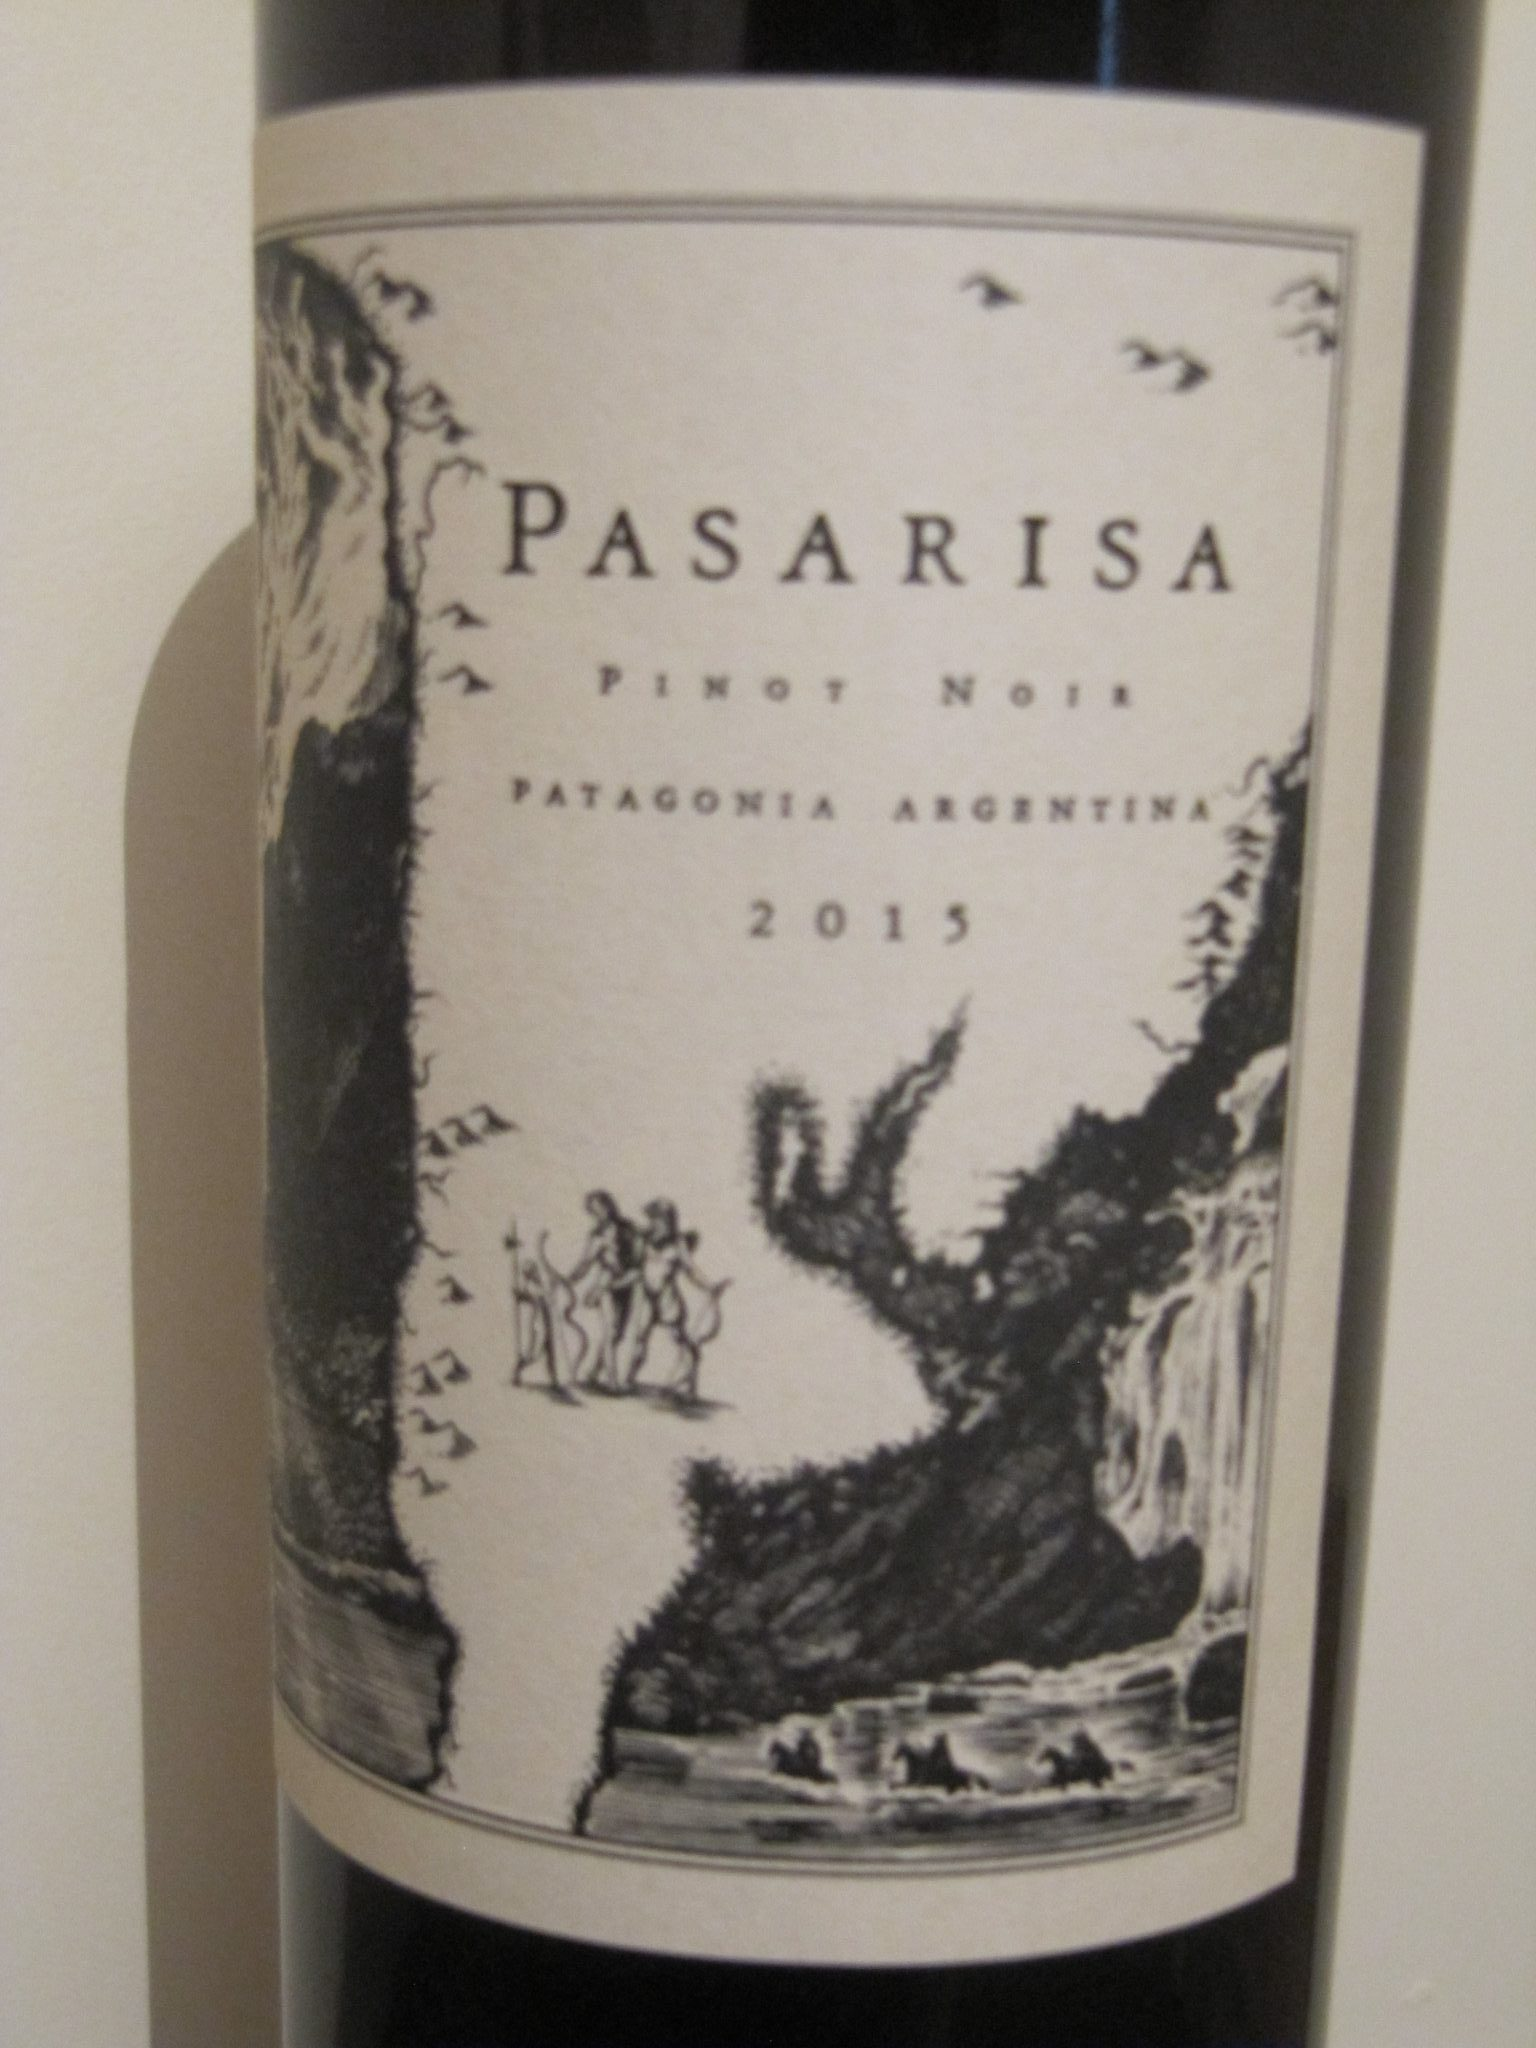 2015 Pinot Noir, Pasarisa, Patagonia, Argentina